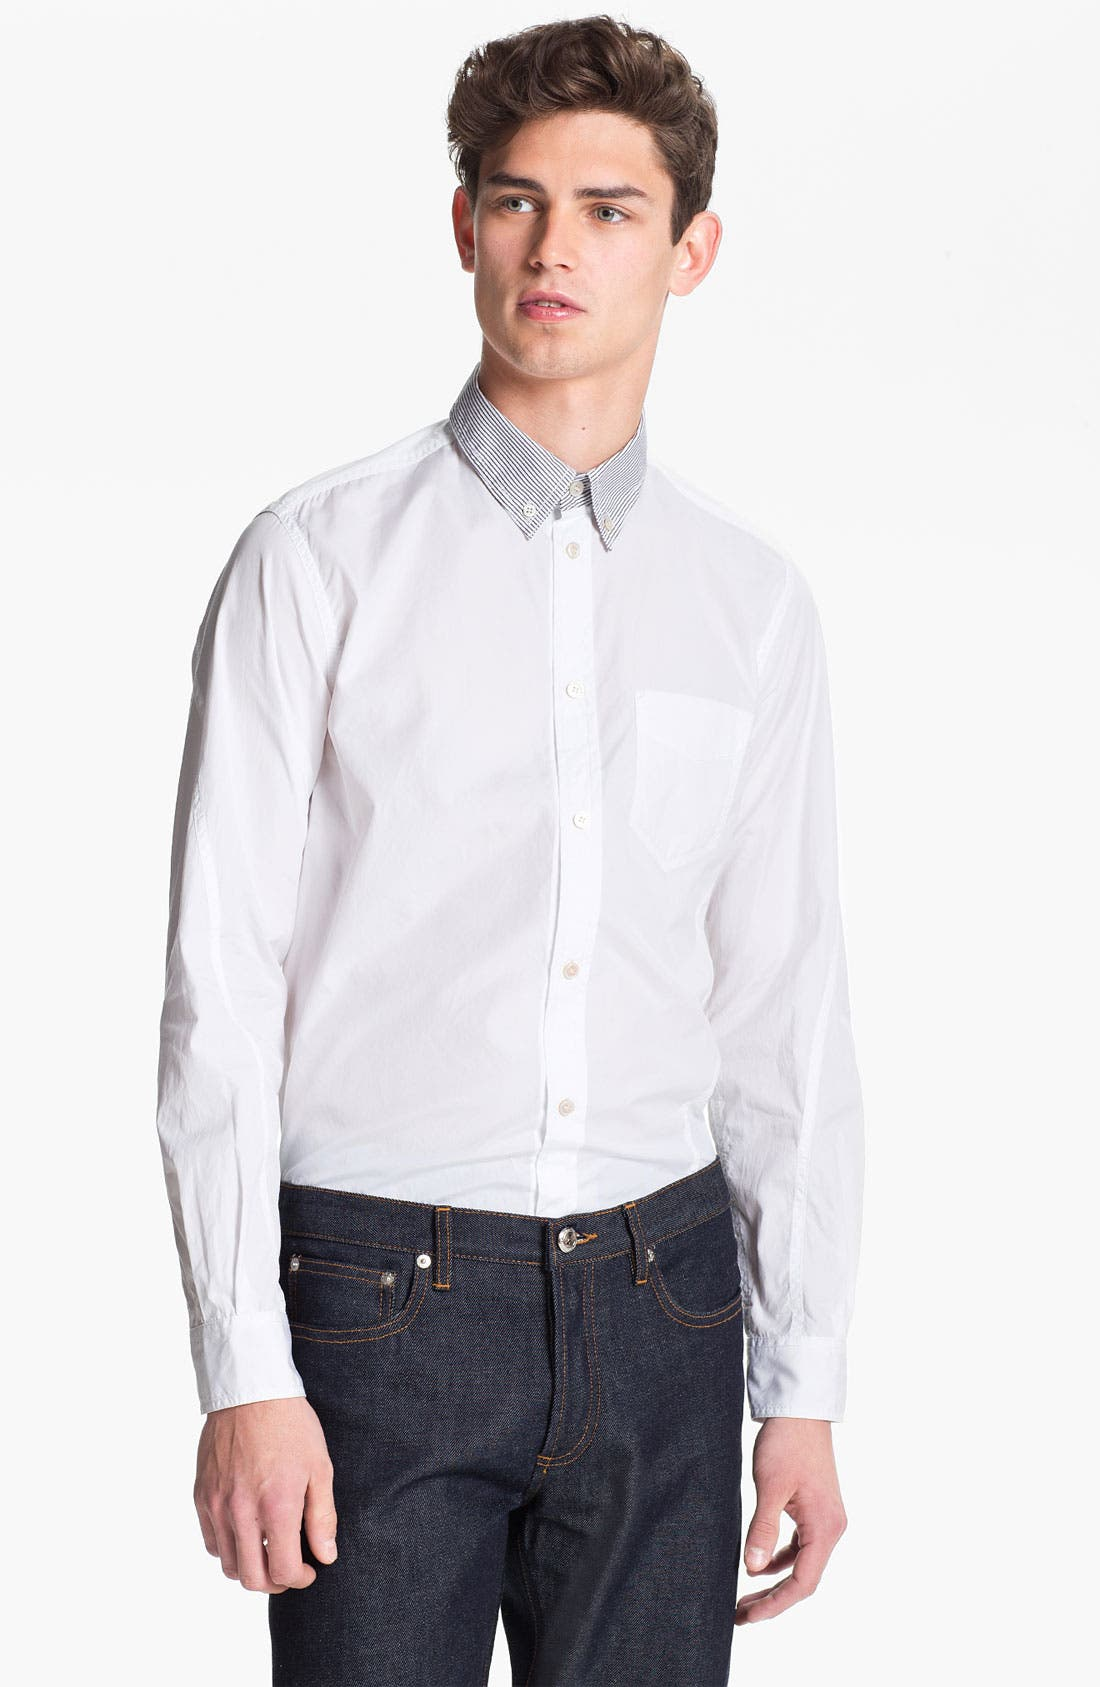 Alternate Image 1 Selected - U Clothing 'Tate' Woven Shirt